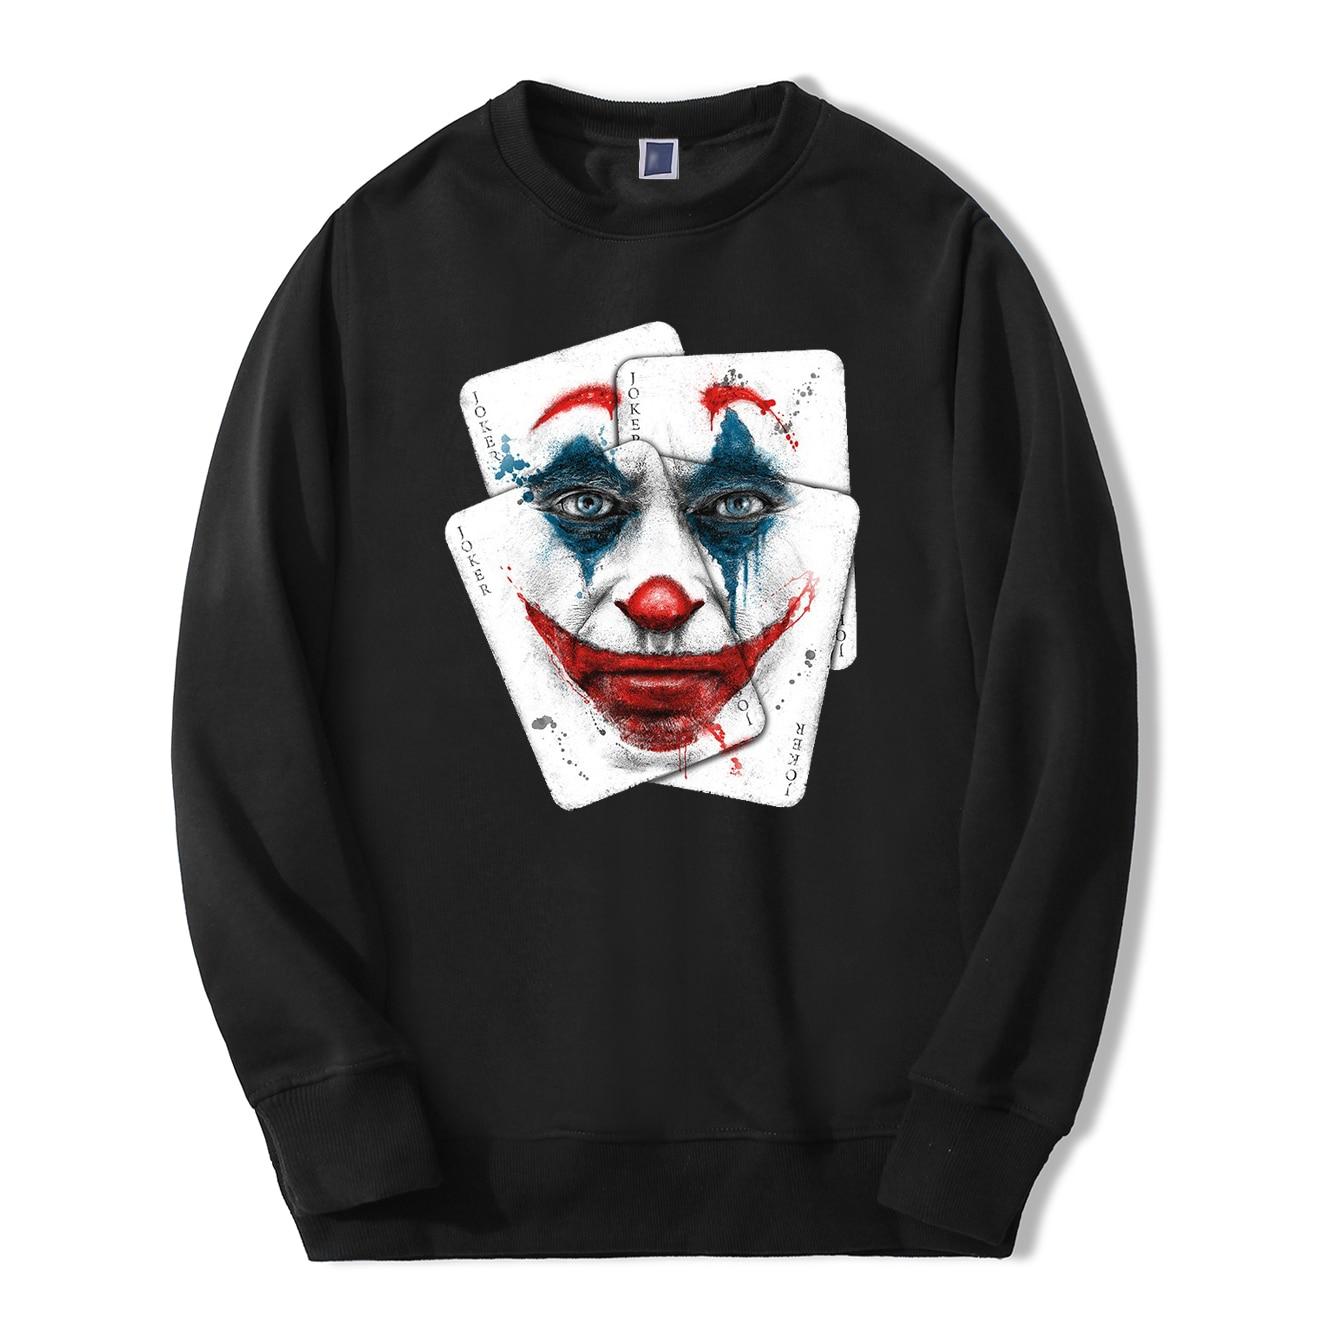 Joaquin Phoenix Joker Men Sweatshirt Hoodies 2020 Spring Autumn Casual Joker Streetwear Hip Hop Fashoin Cool Joker New Pullover